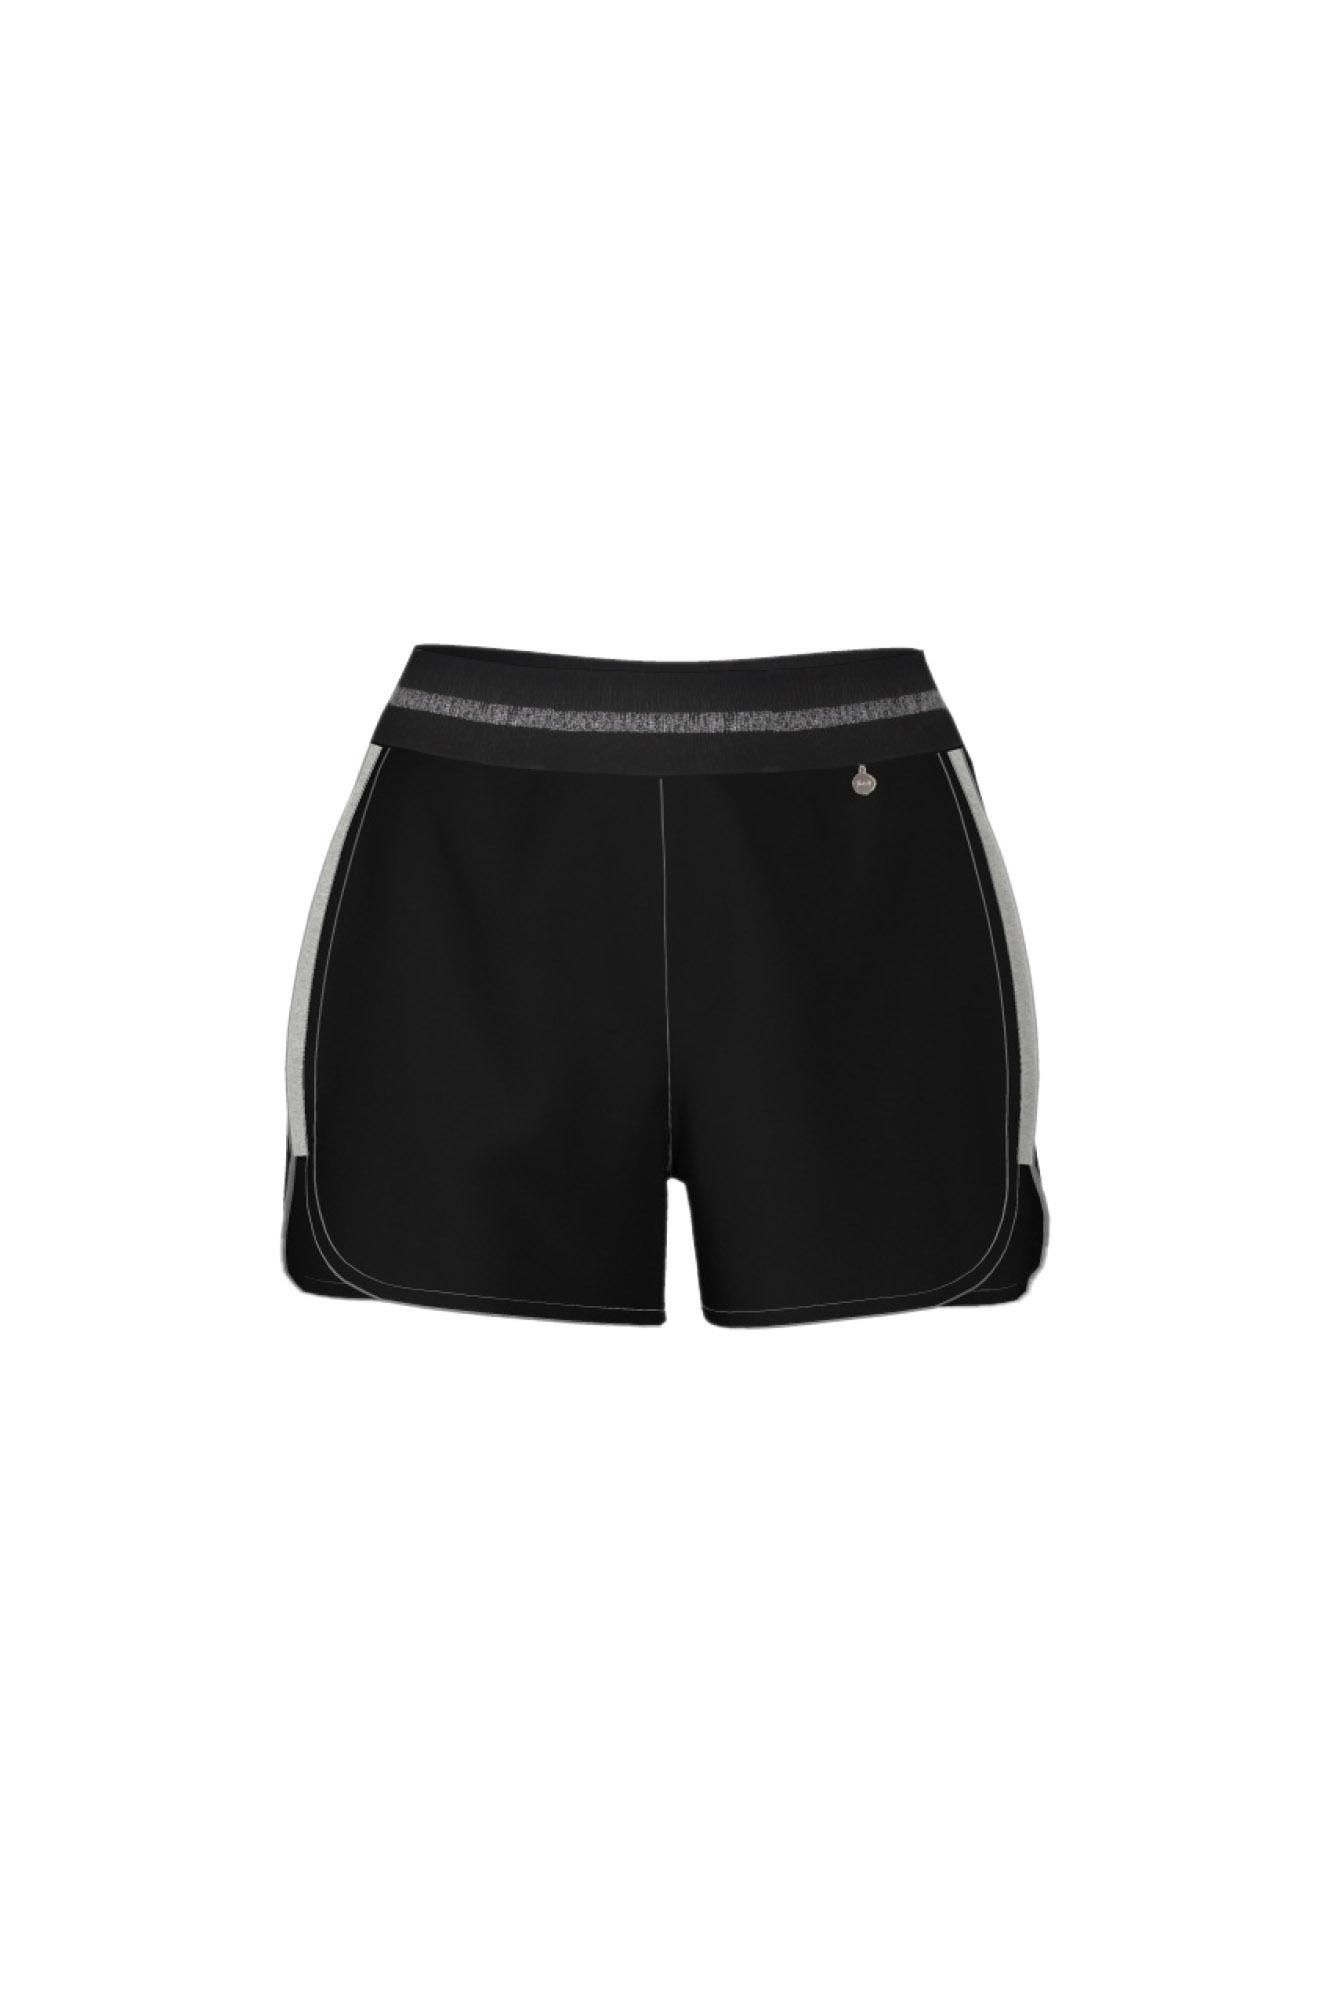 Women's Sports Shorts